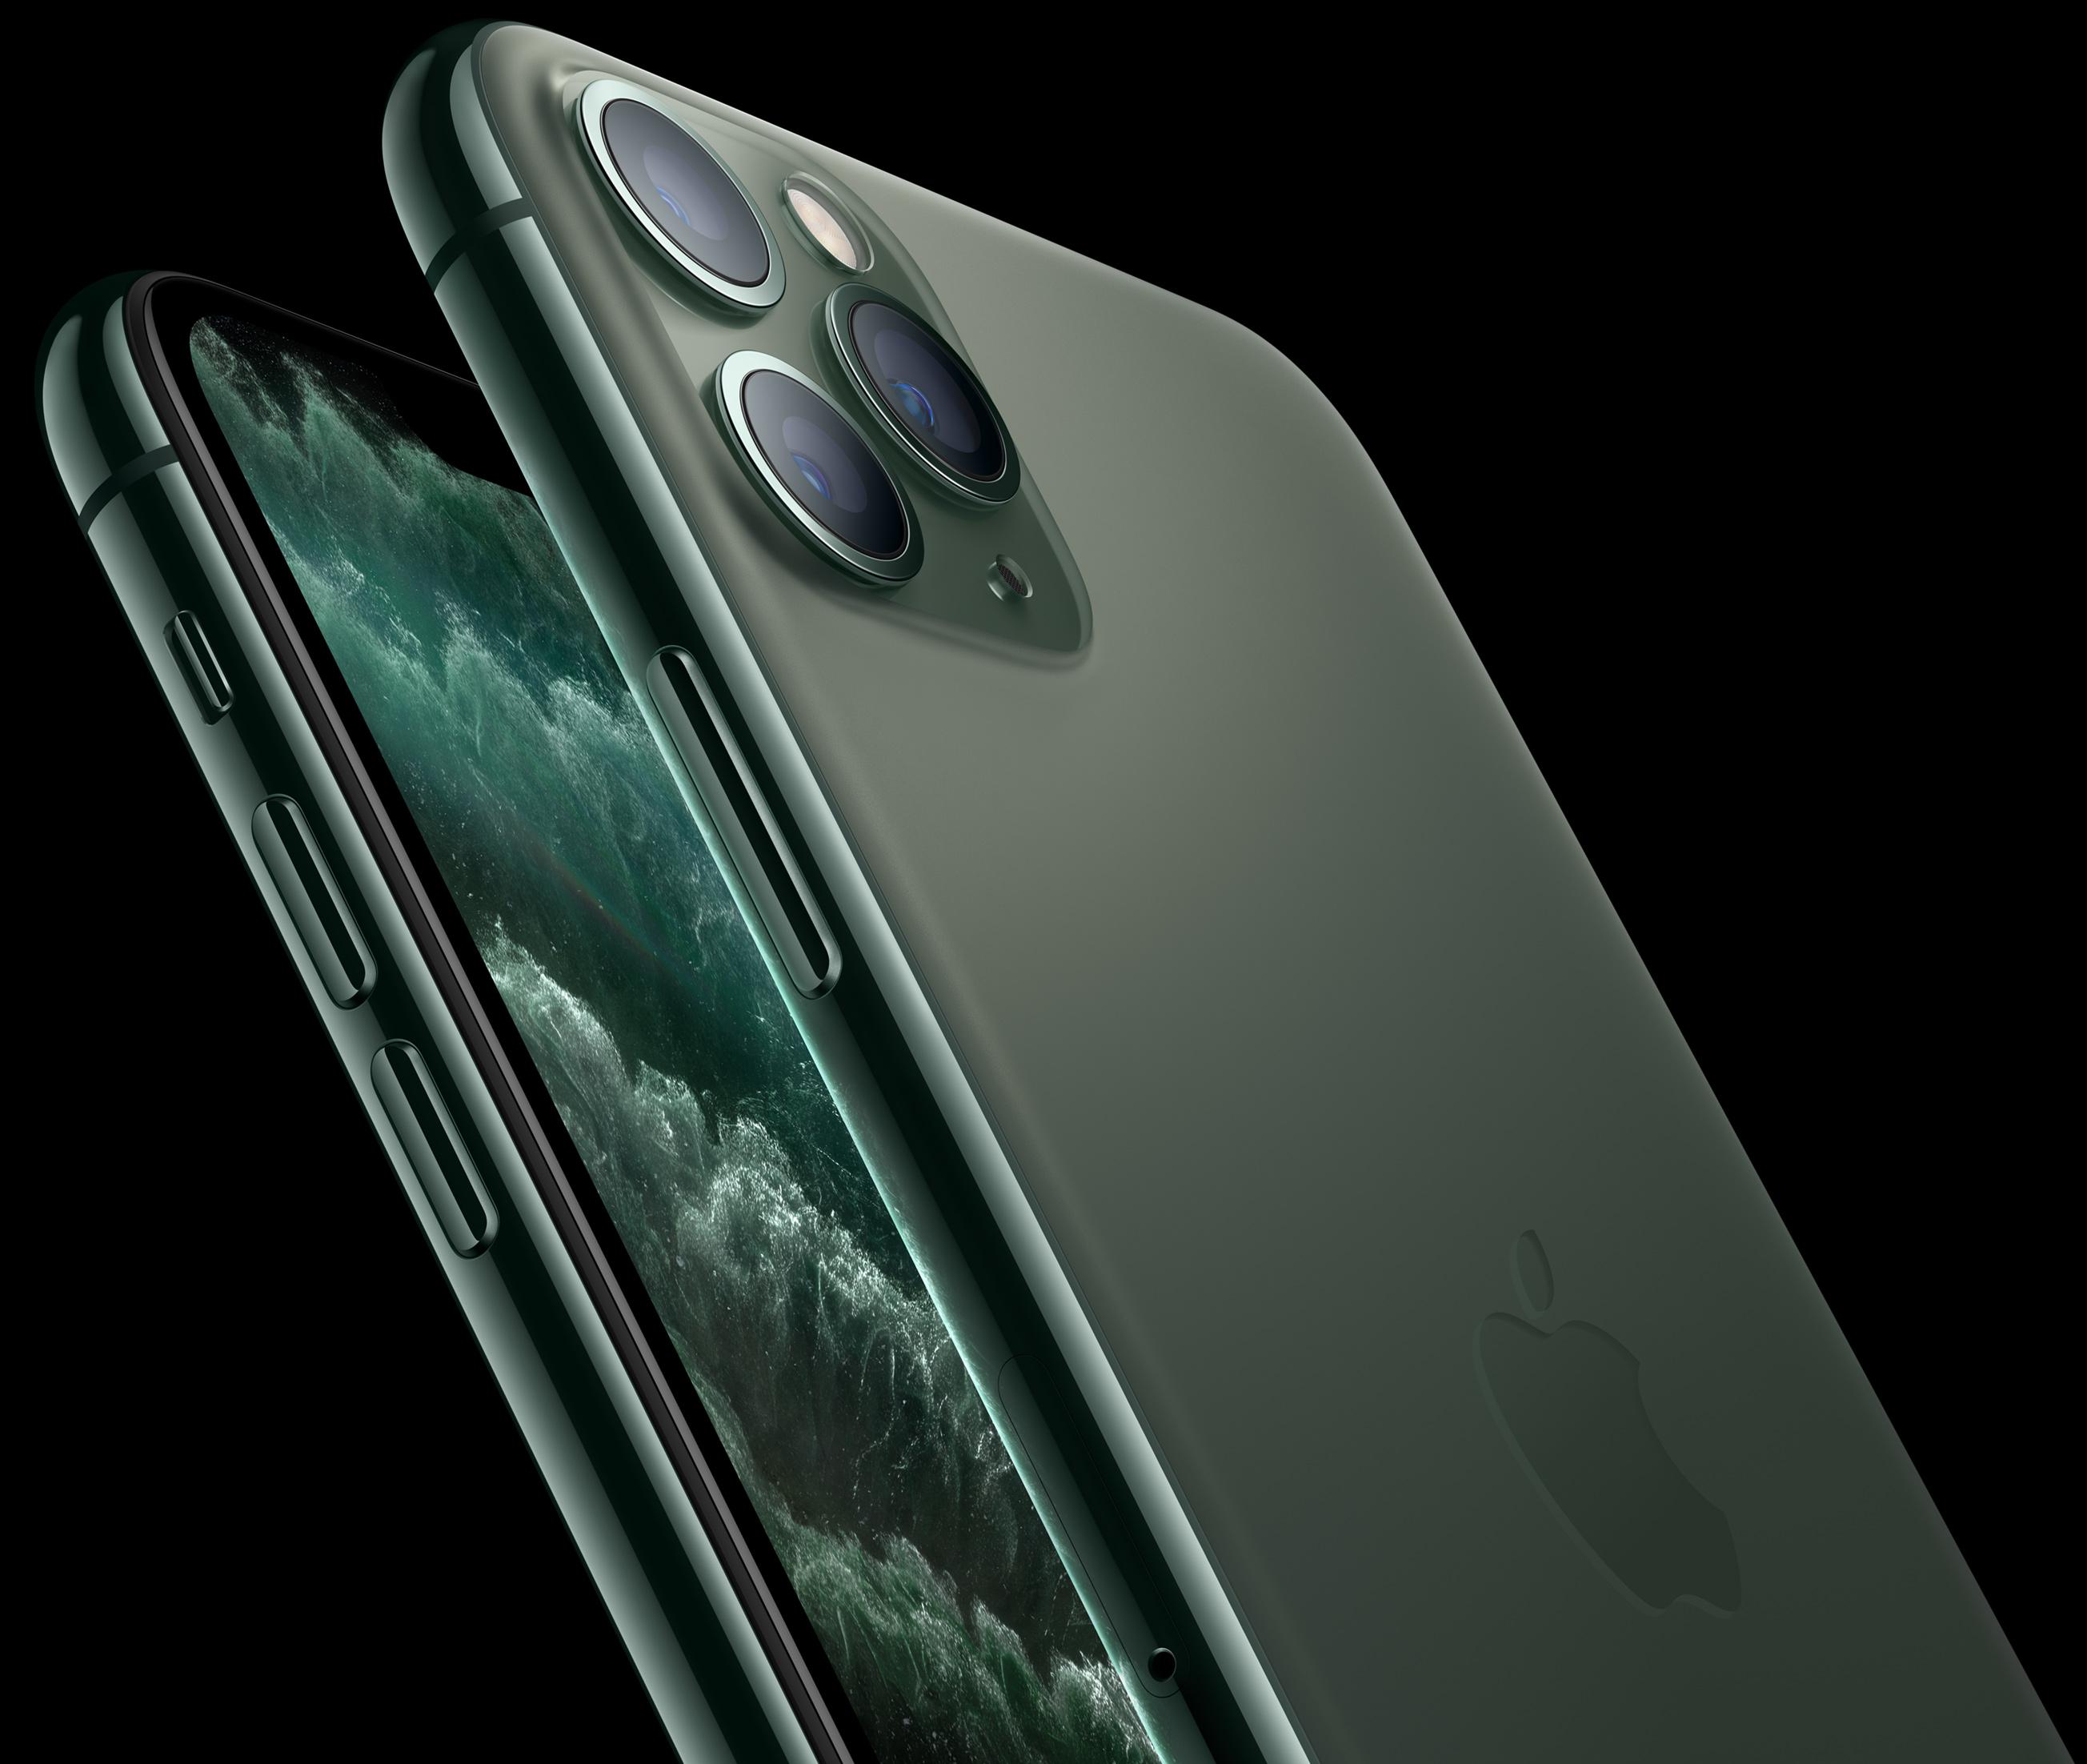 iphone 11 pro max 512 midnight green